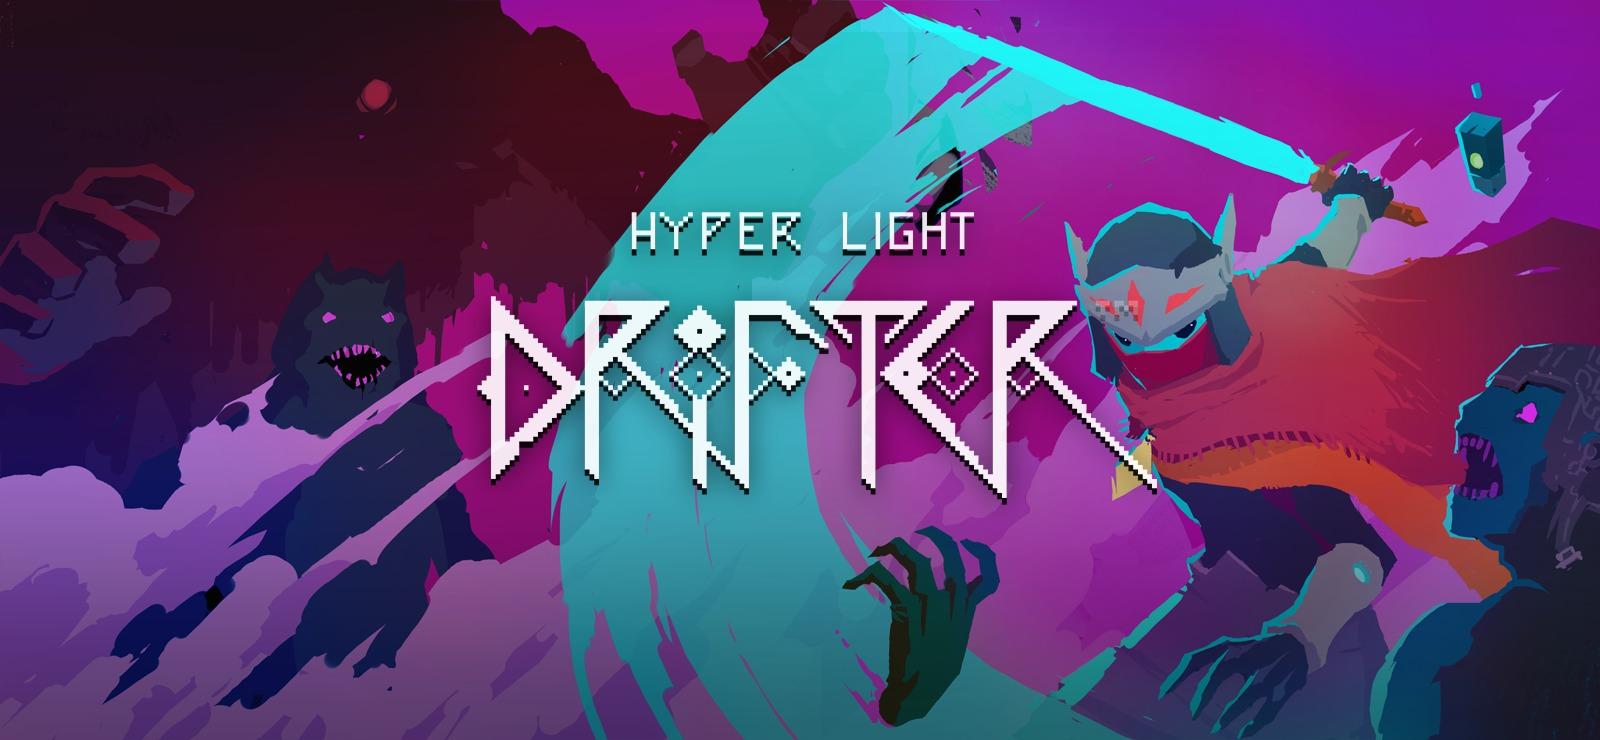 HQ Hyper Light Drifter Wallpapers | File 186.66Kb